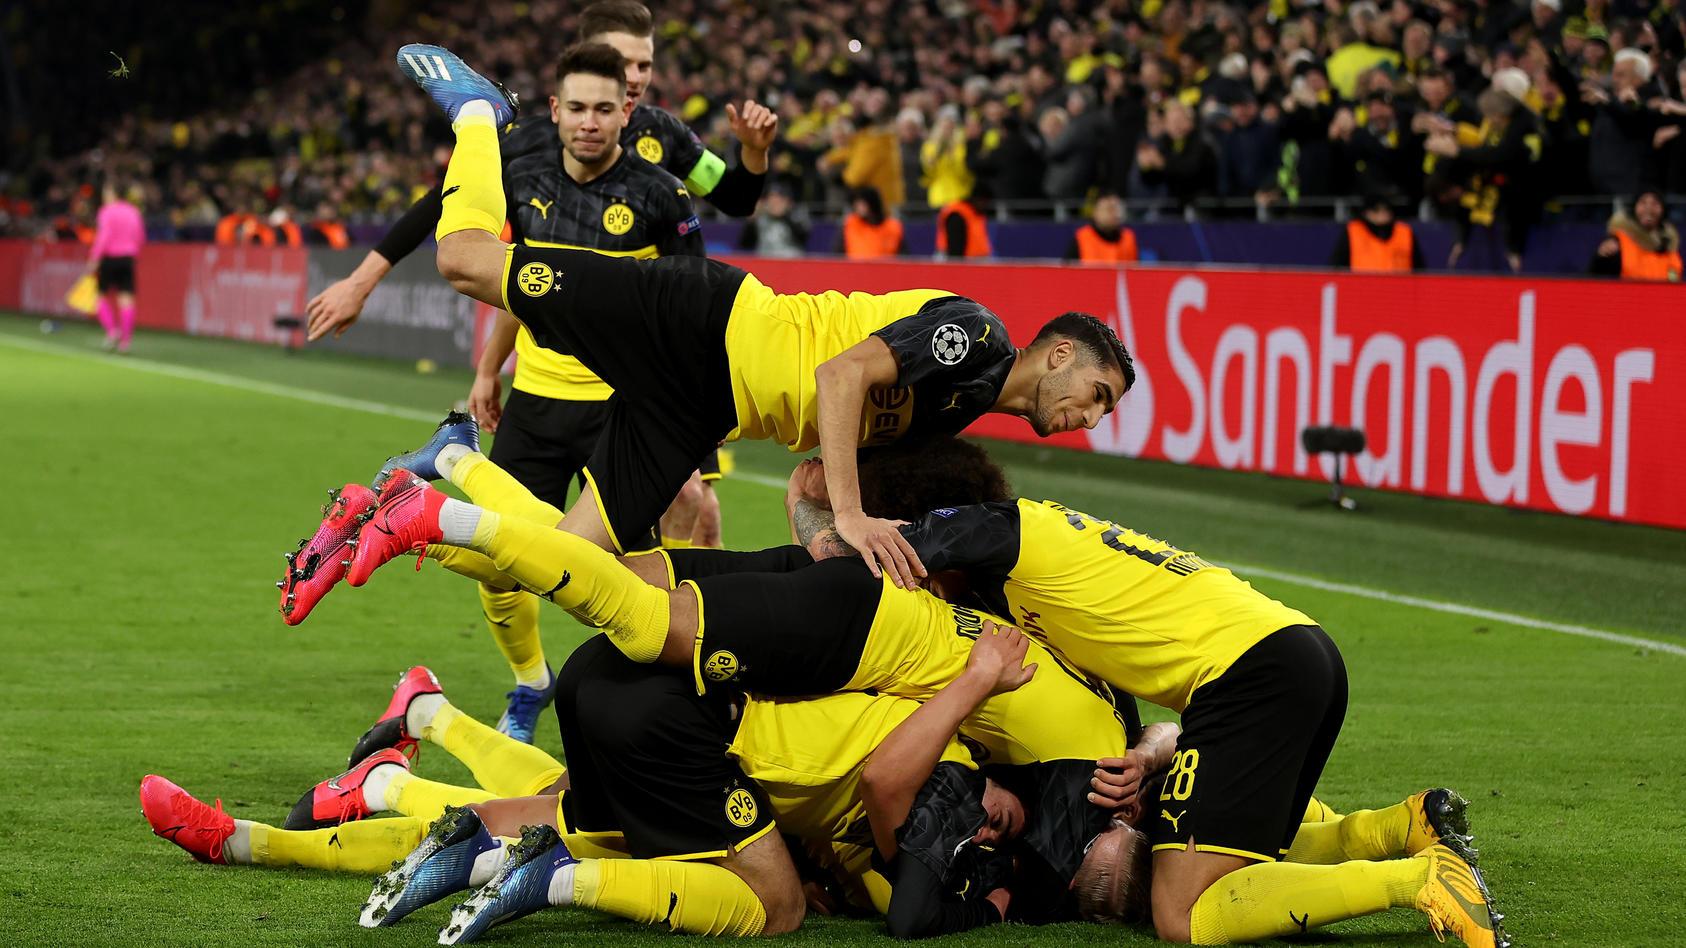 ***BESTPIX*** Borussia Dortmund v Paris Saint-Germain - UEFA Champions League Round of 16: First Leg